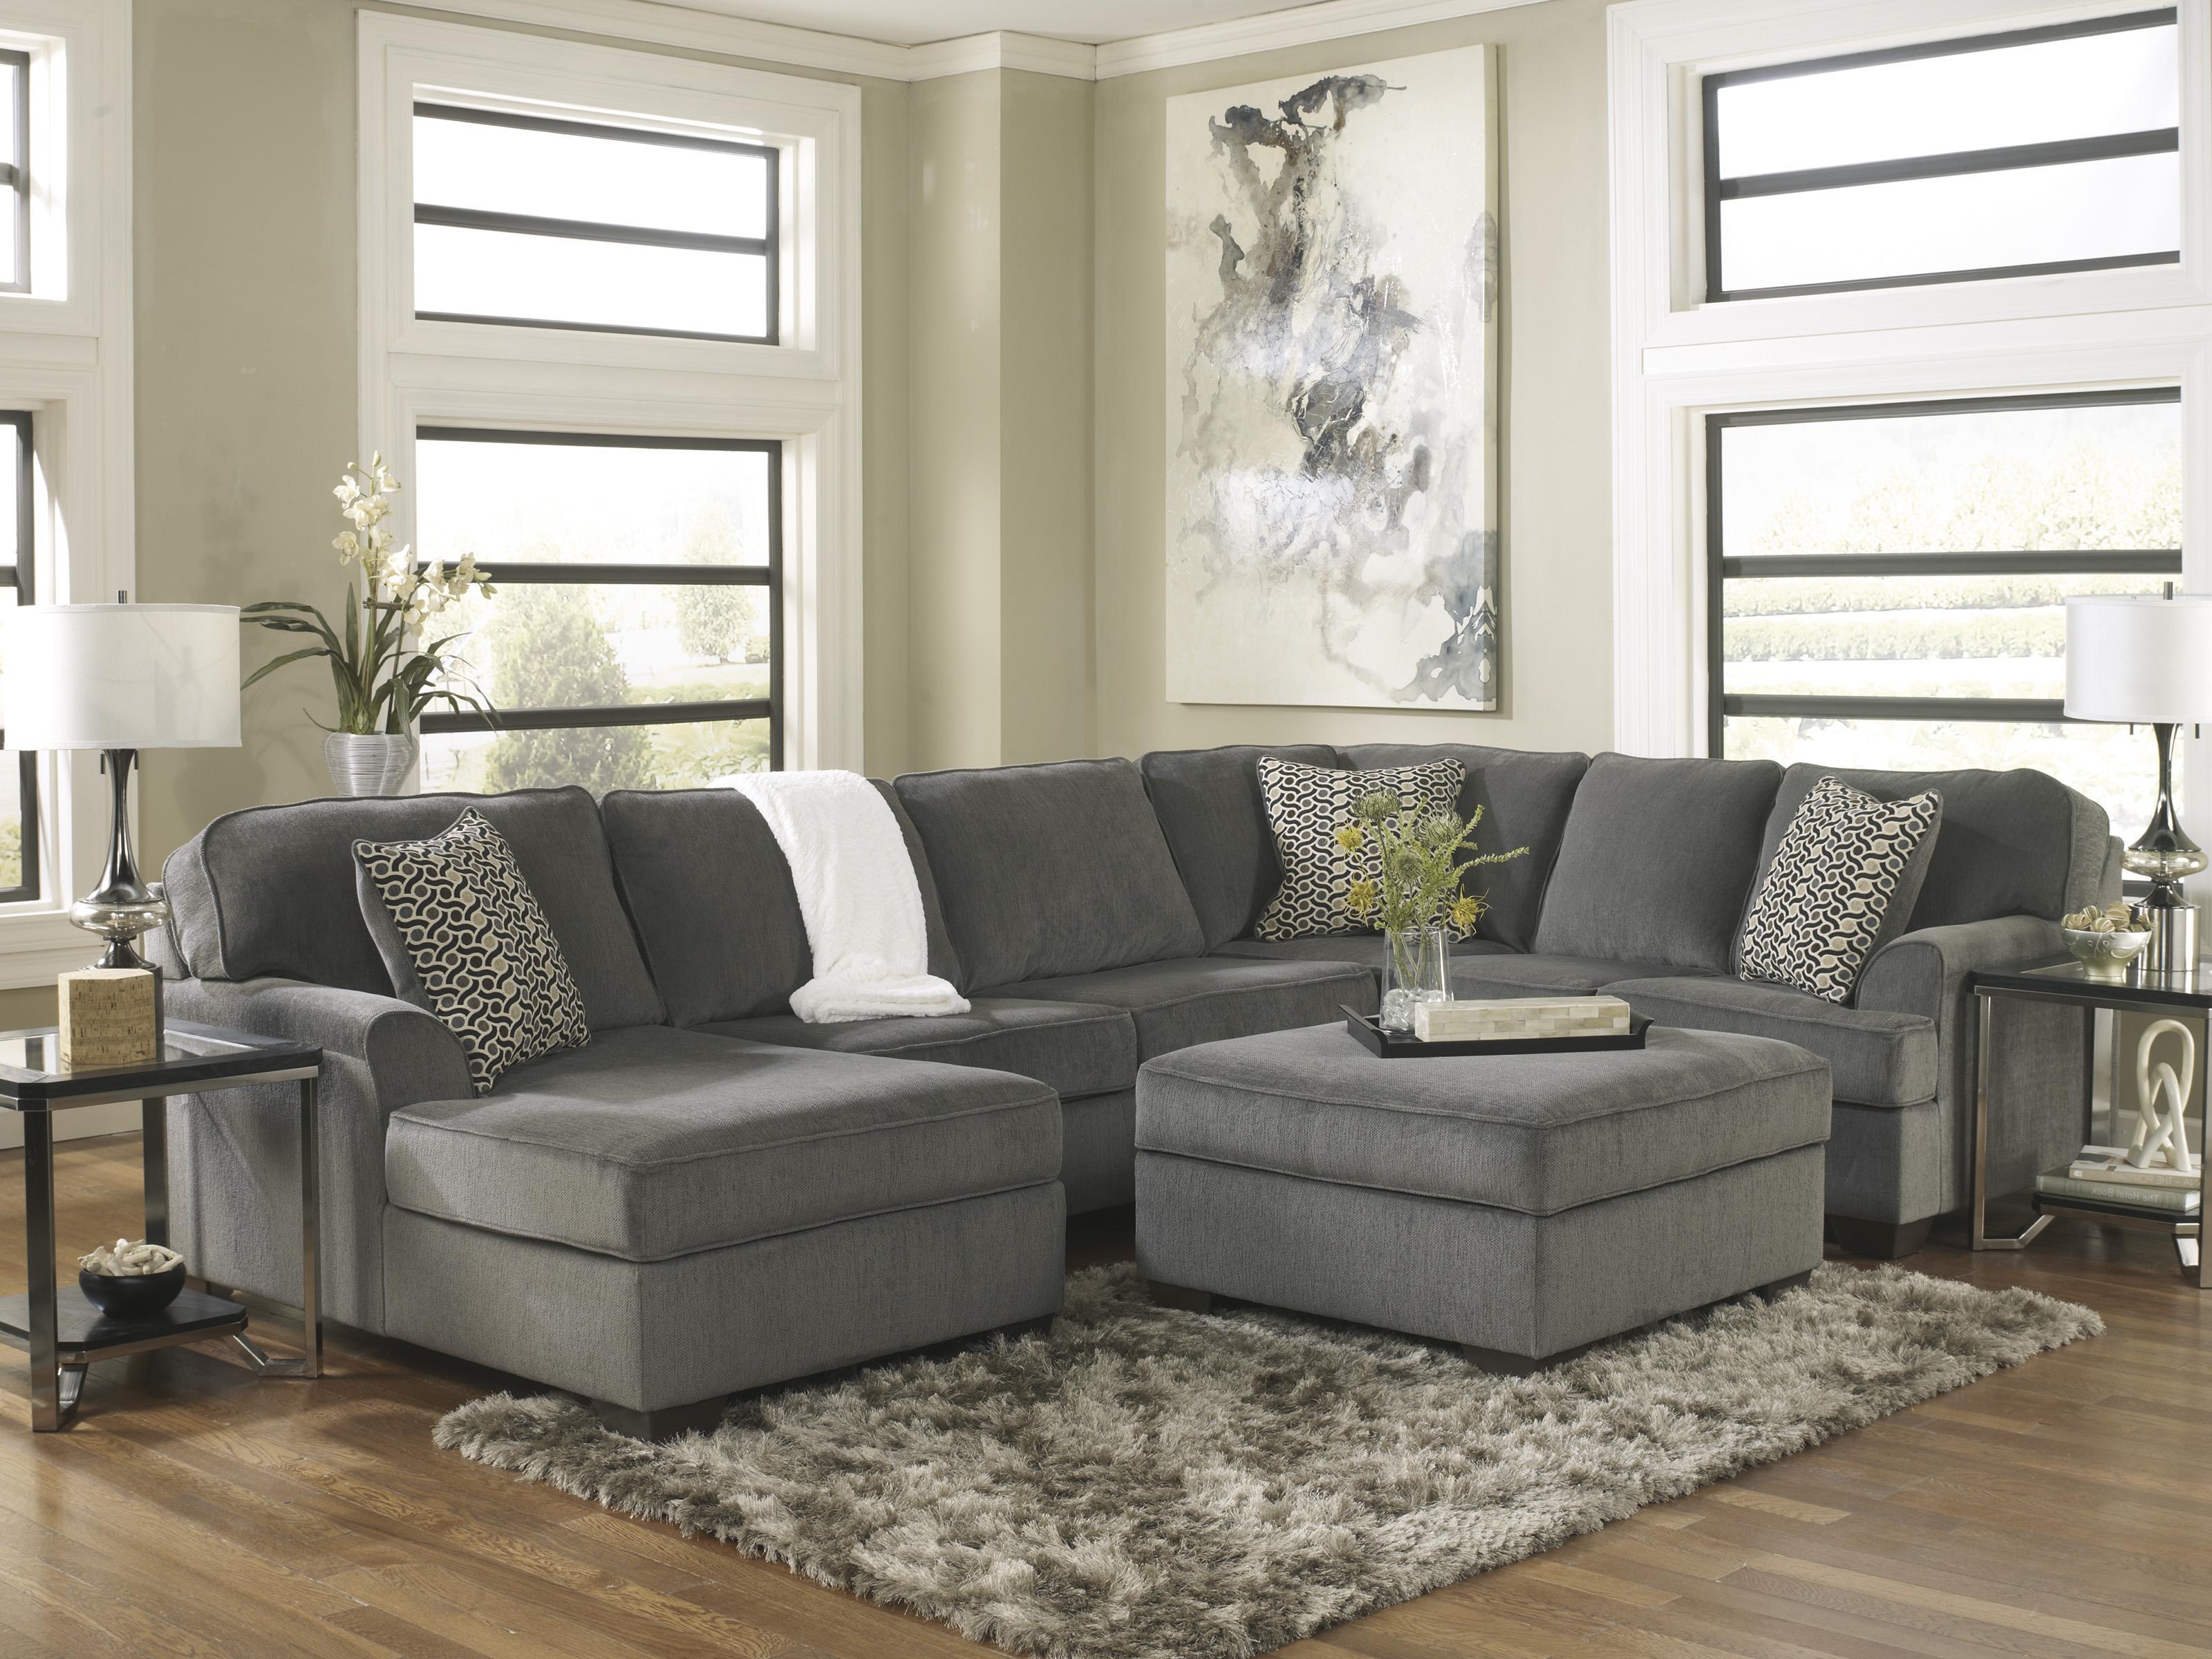 Ashley Furniture Loric - Smoke Stationary Living Room ...